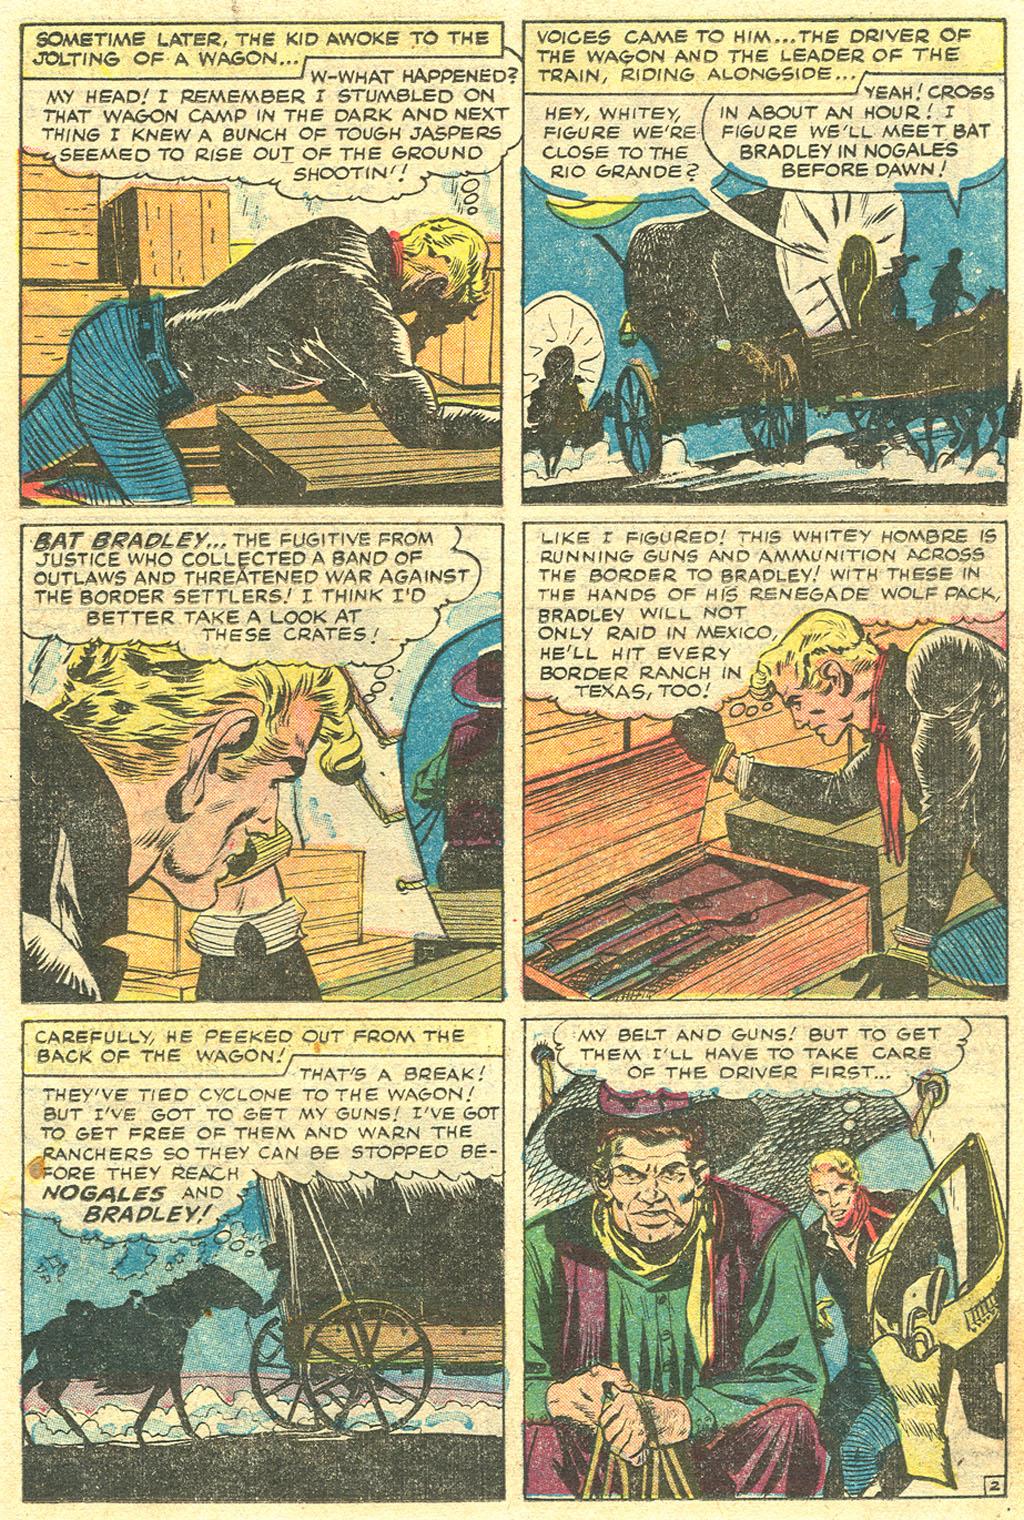 Read online Two-Gun Kid comic -  Issue #29 - 11